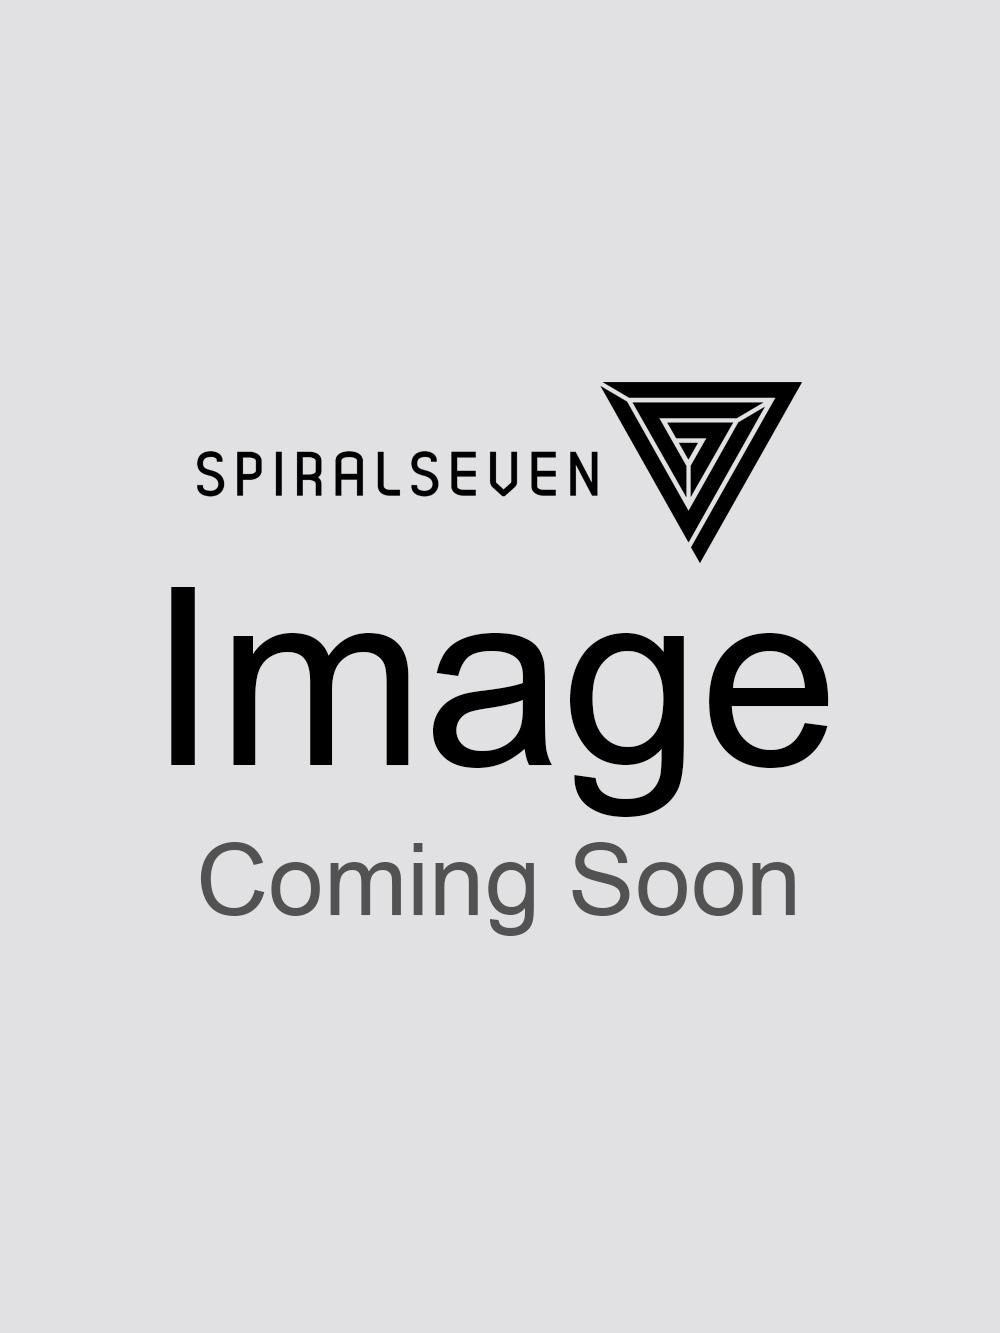 5d884c90 Sik Silk S/S Jeremy Vine Raglan Curved Hem T-Shirt White | Spiral ...